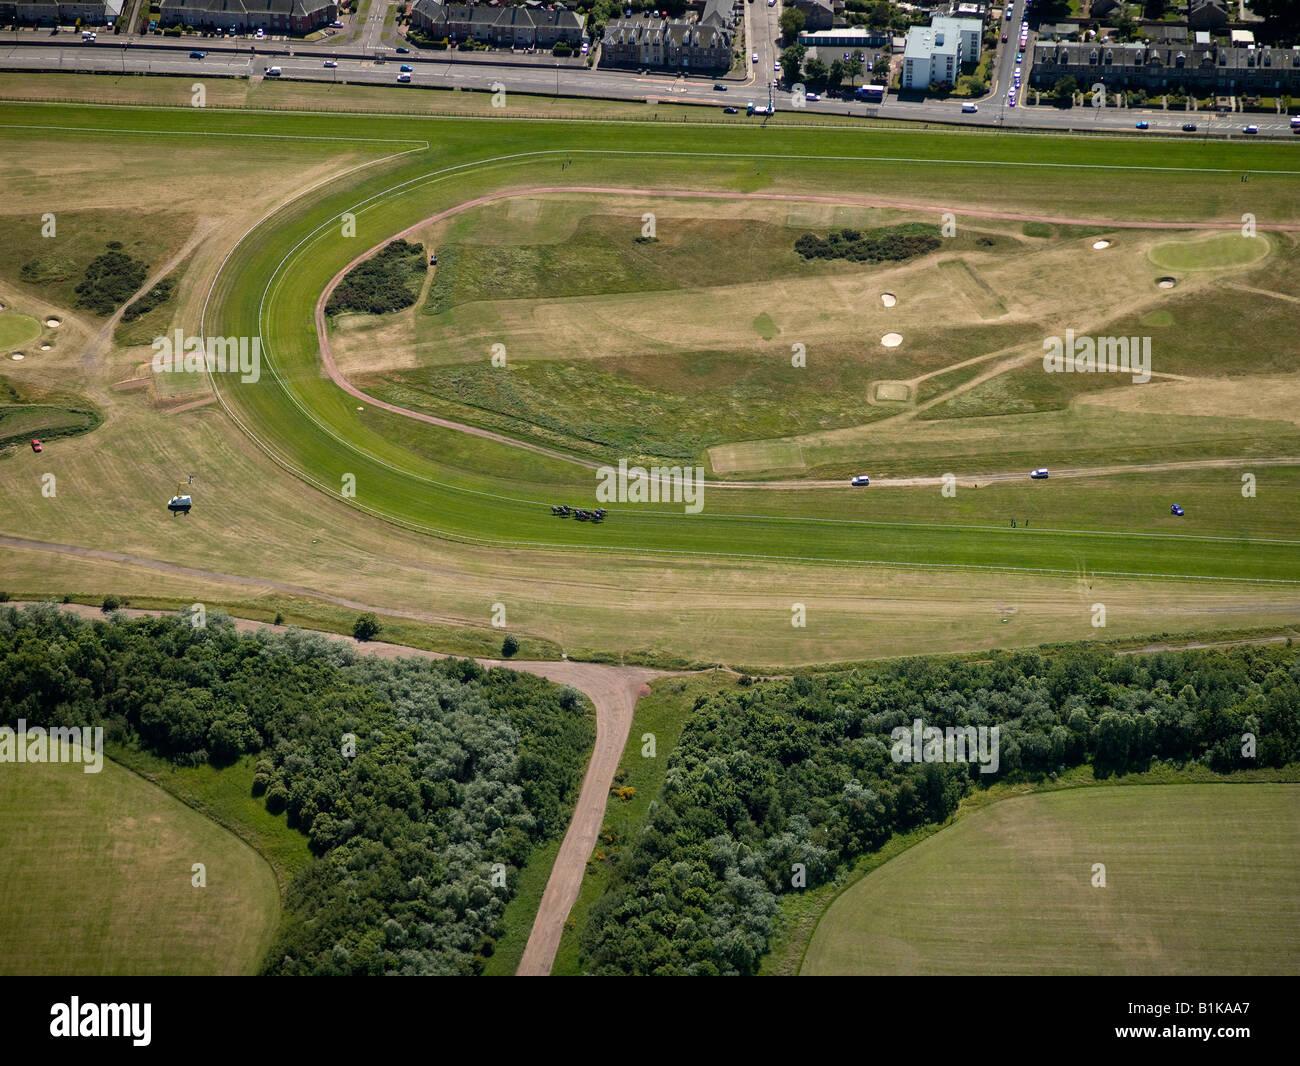 Horses racing at Musselburgh Race Course, Lothian, Scotland - Stock Image